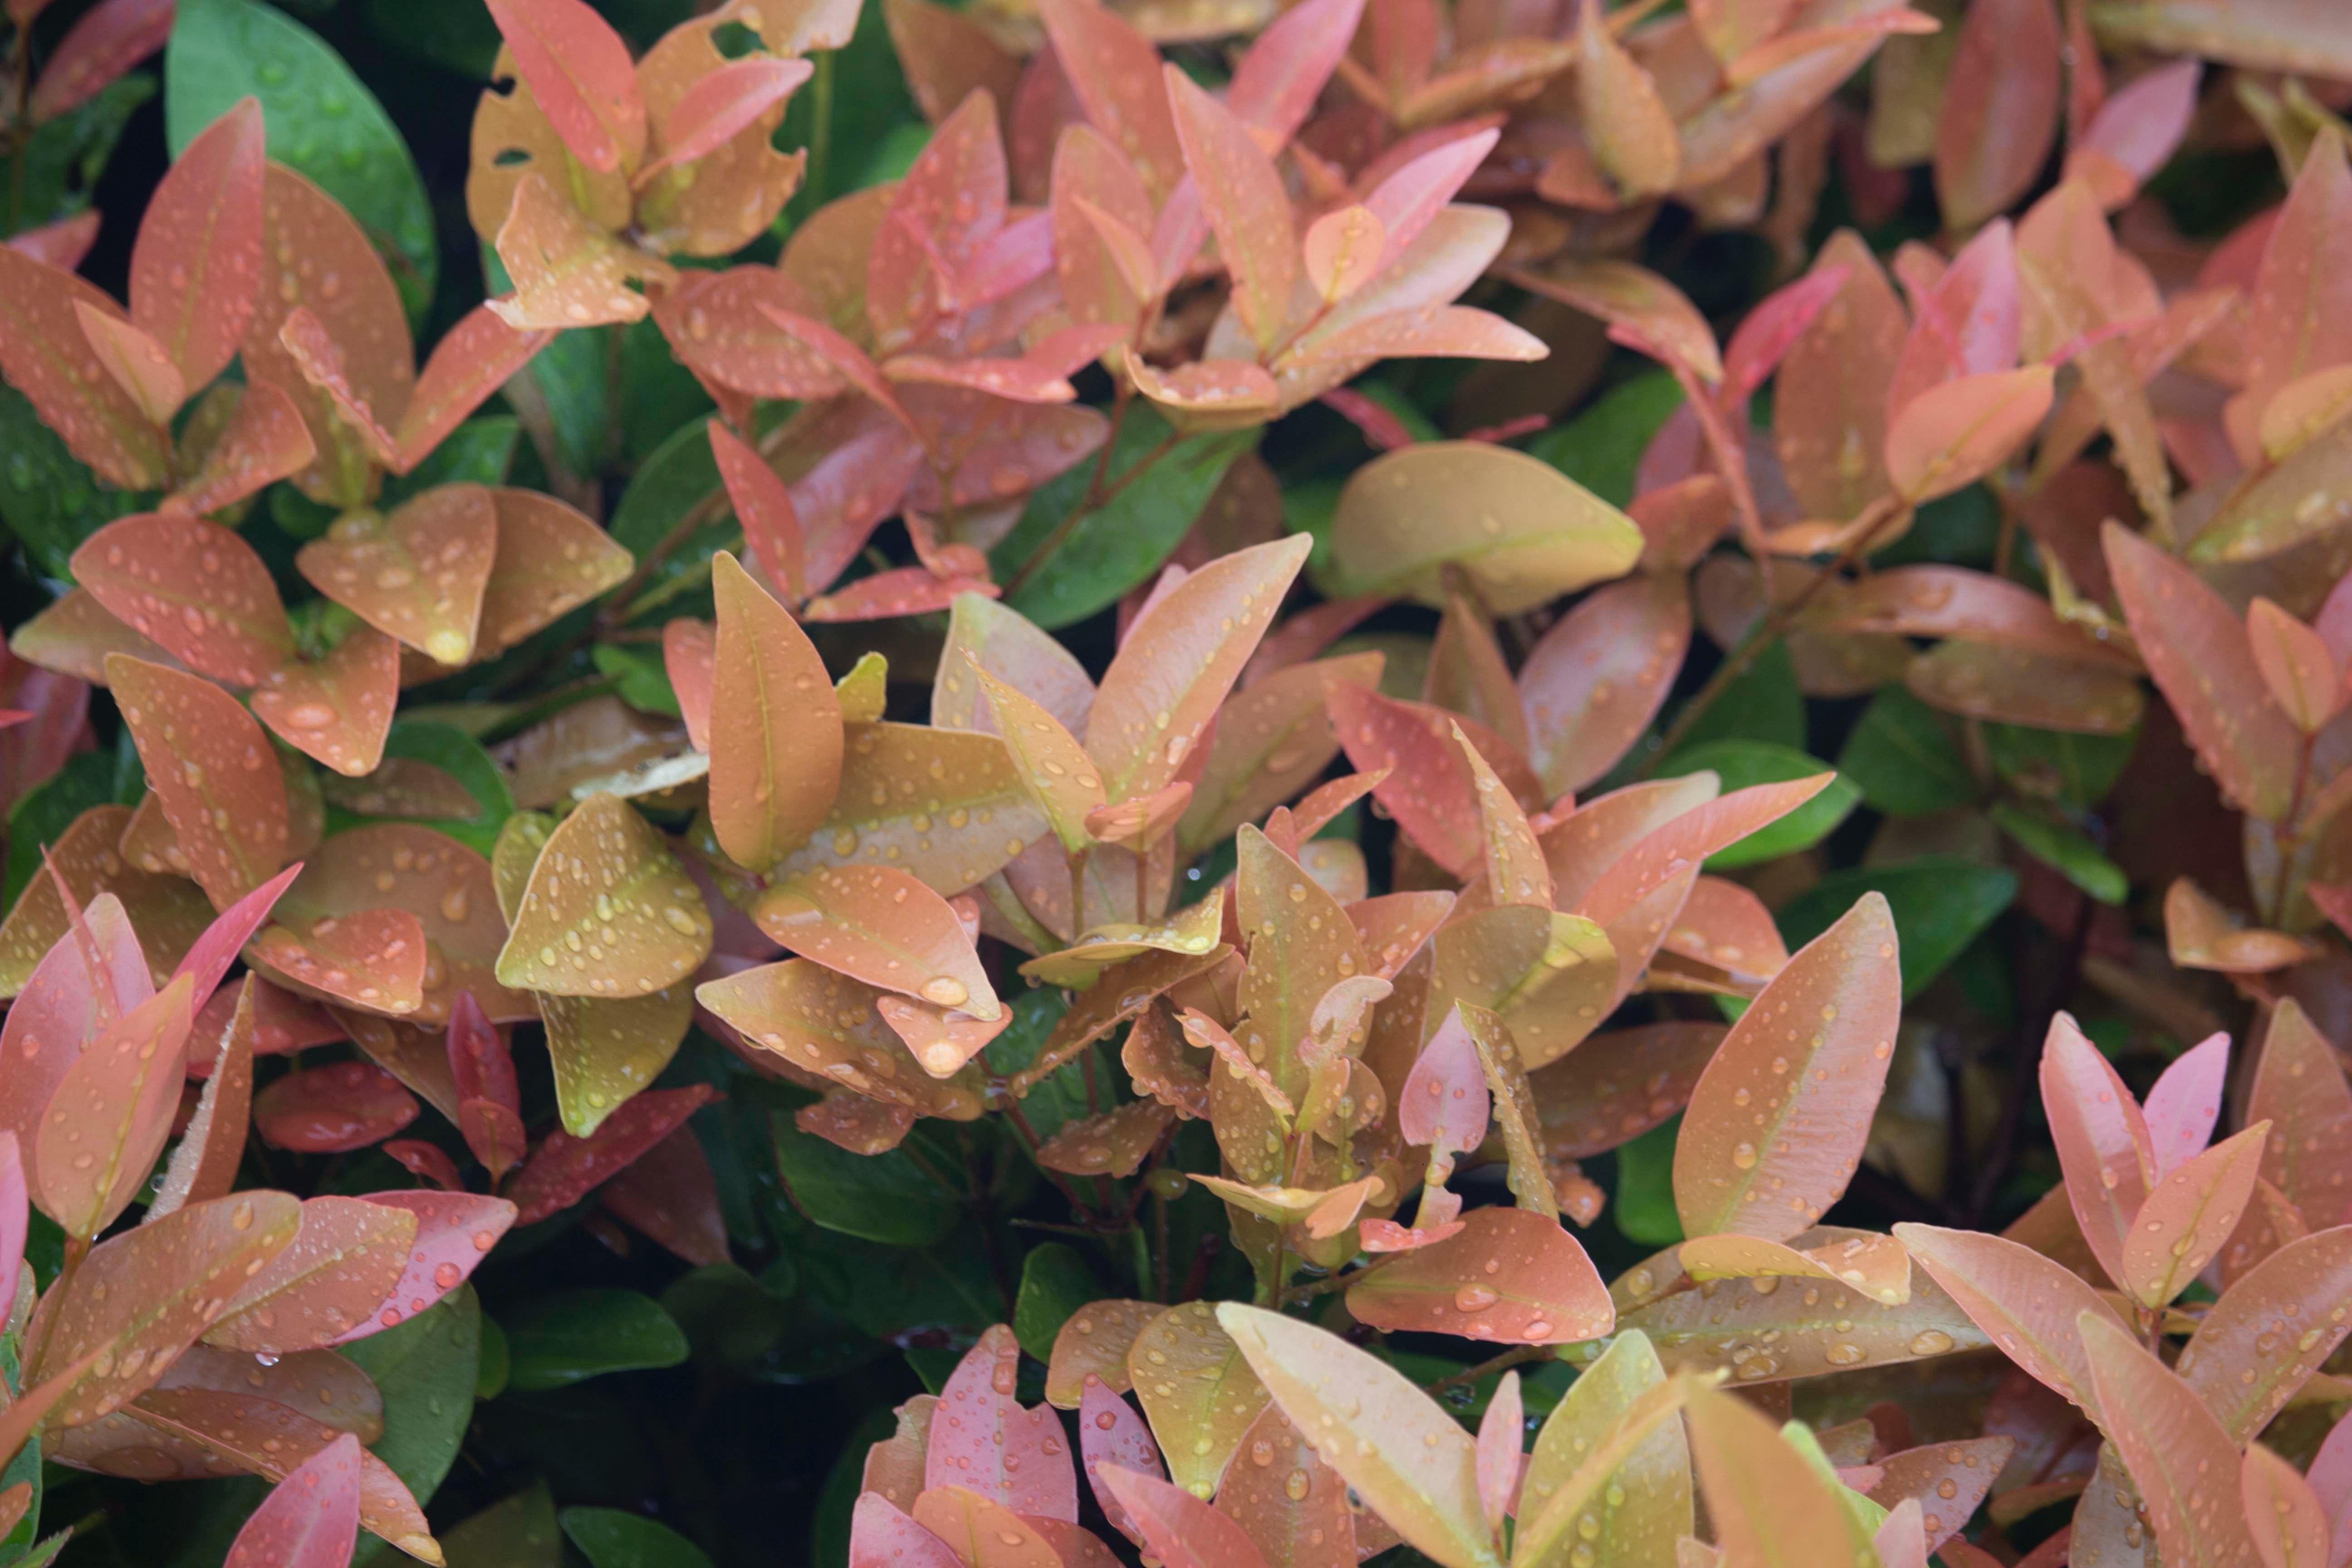 10 Manfaat Tanaman Pucuk Merah Untuk Tubuh Lingkungan Rumah123 Com